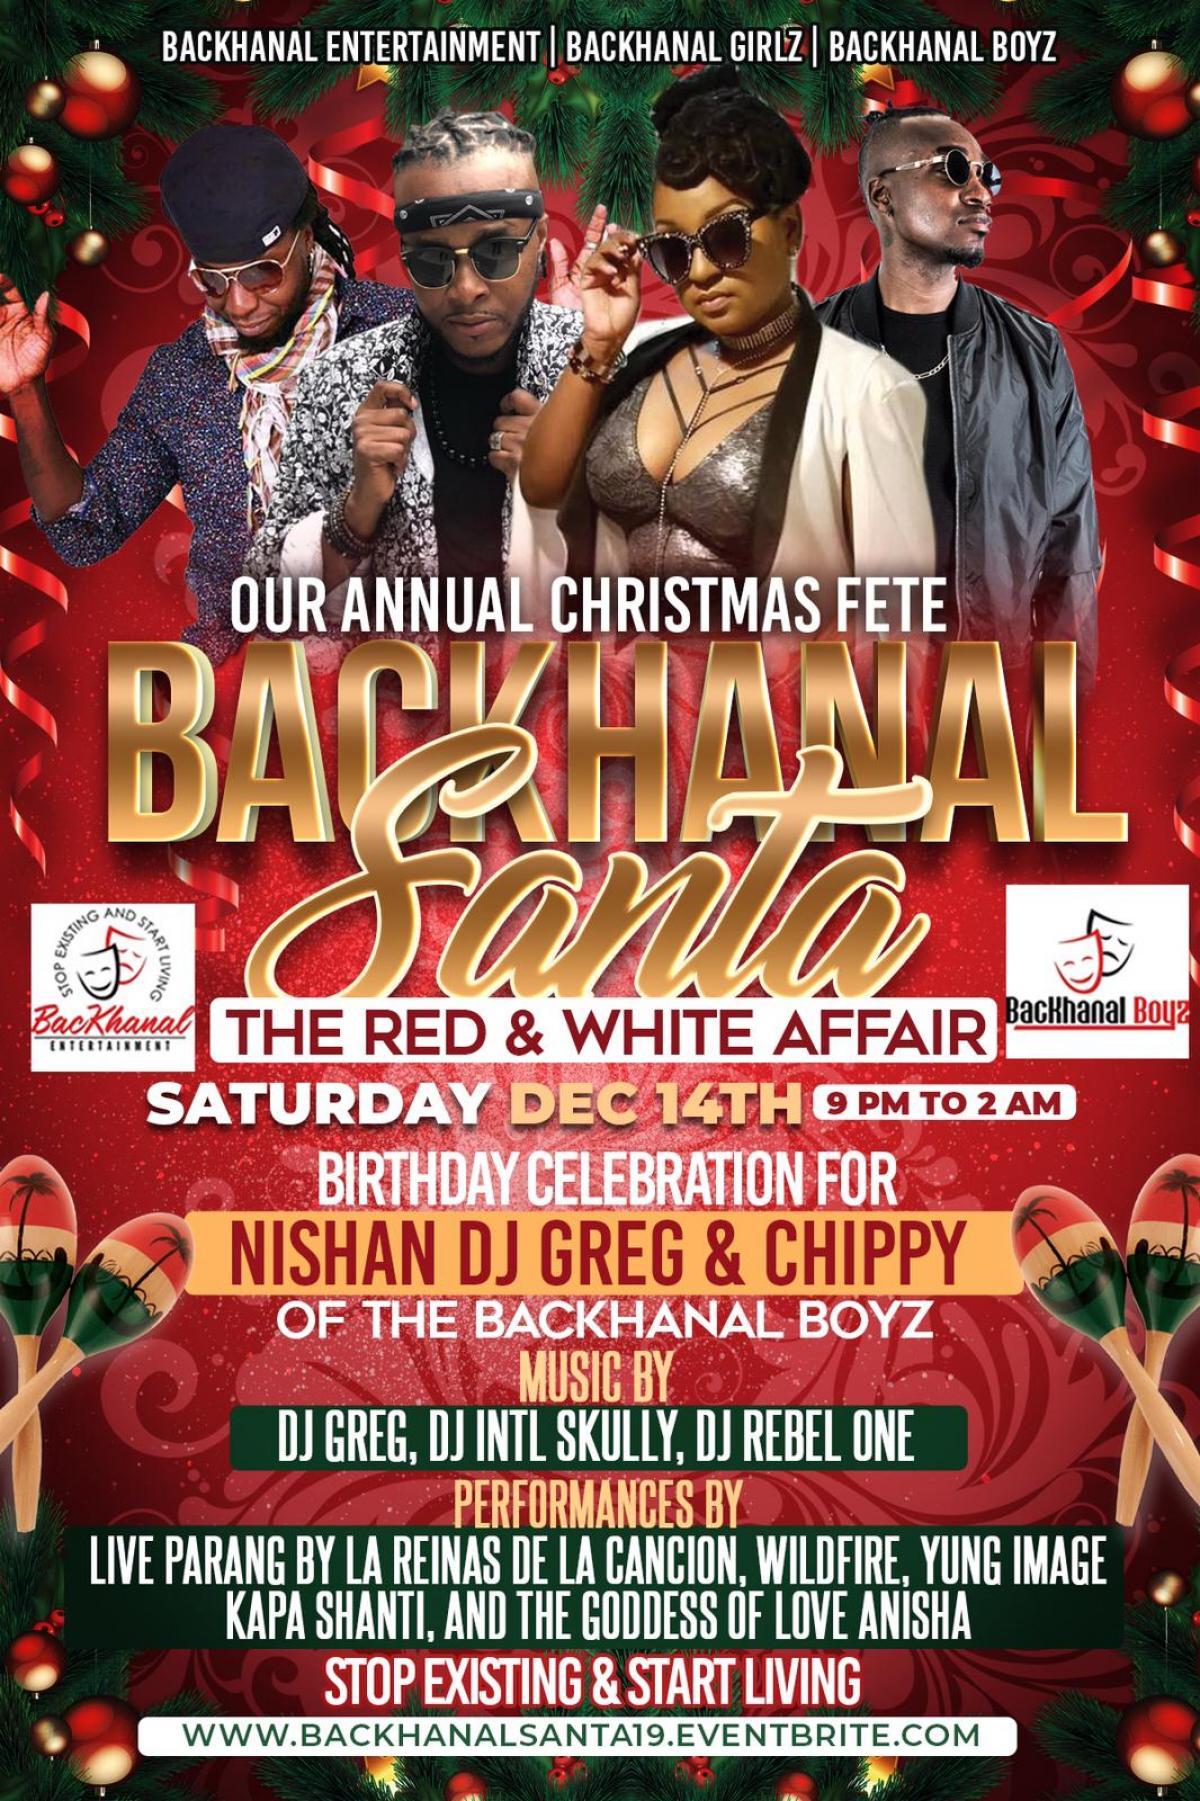 Backhanal Santa flyer or graphic.